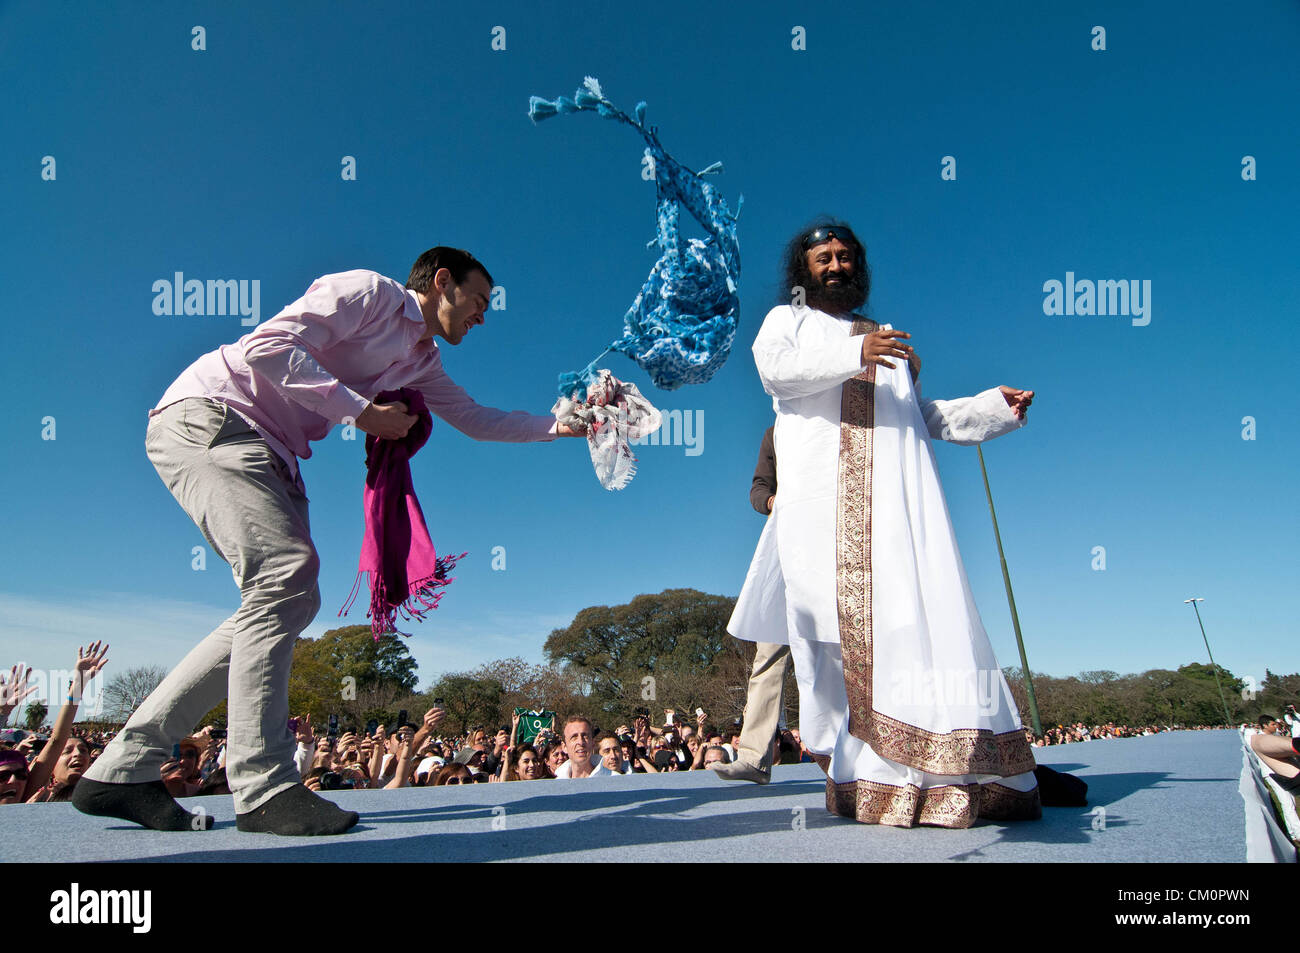 Sett. 9, 2012 - Buenos Aires, Argentina - guru indiano Sri Sri Ravi Shankar, leader della ONG l'arte di vivere, Foto Stock